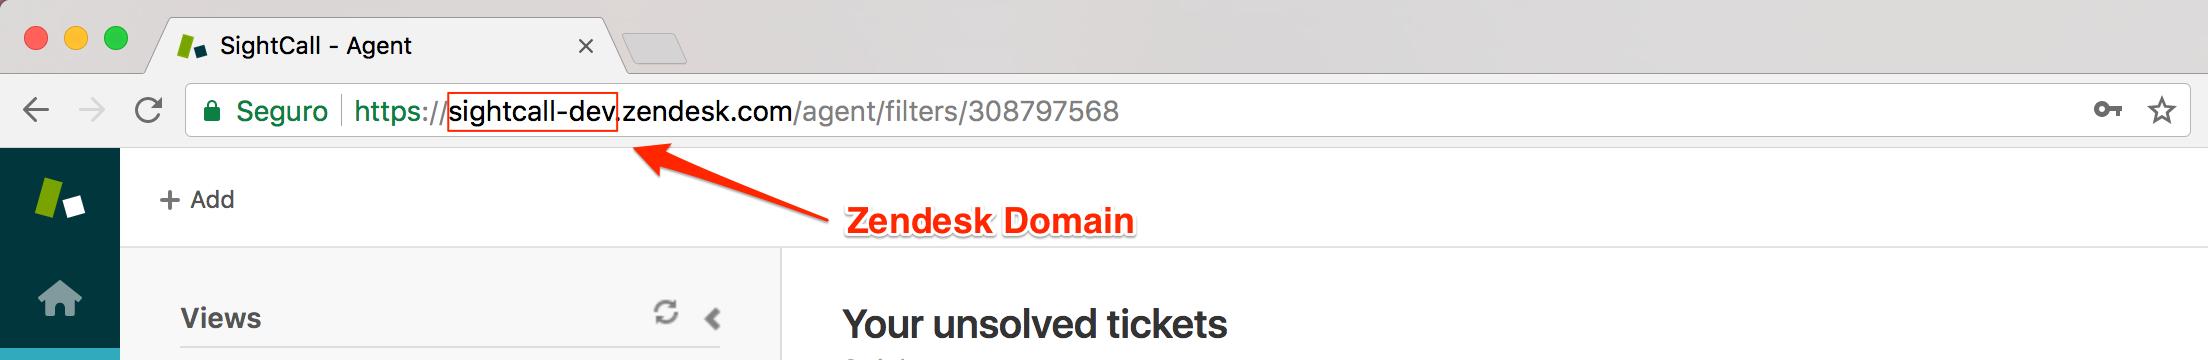 zendesk domain